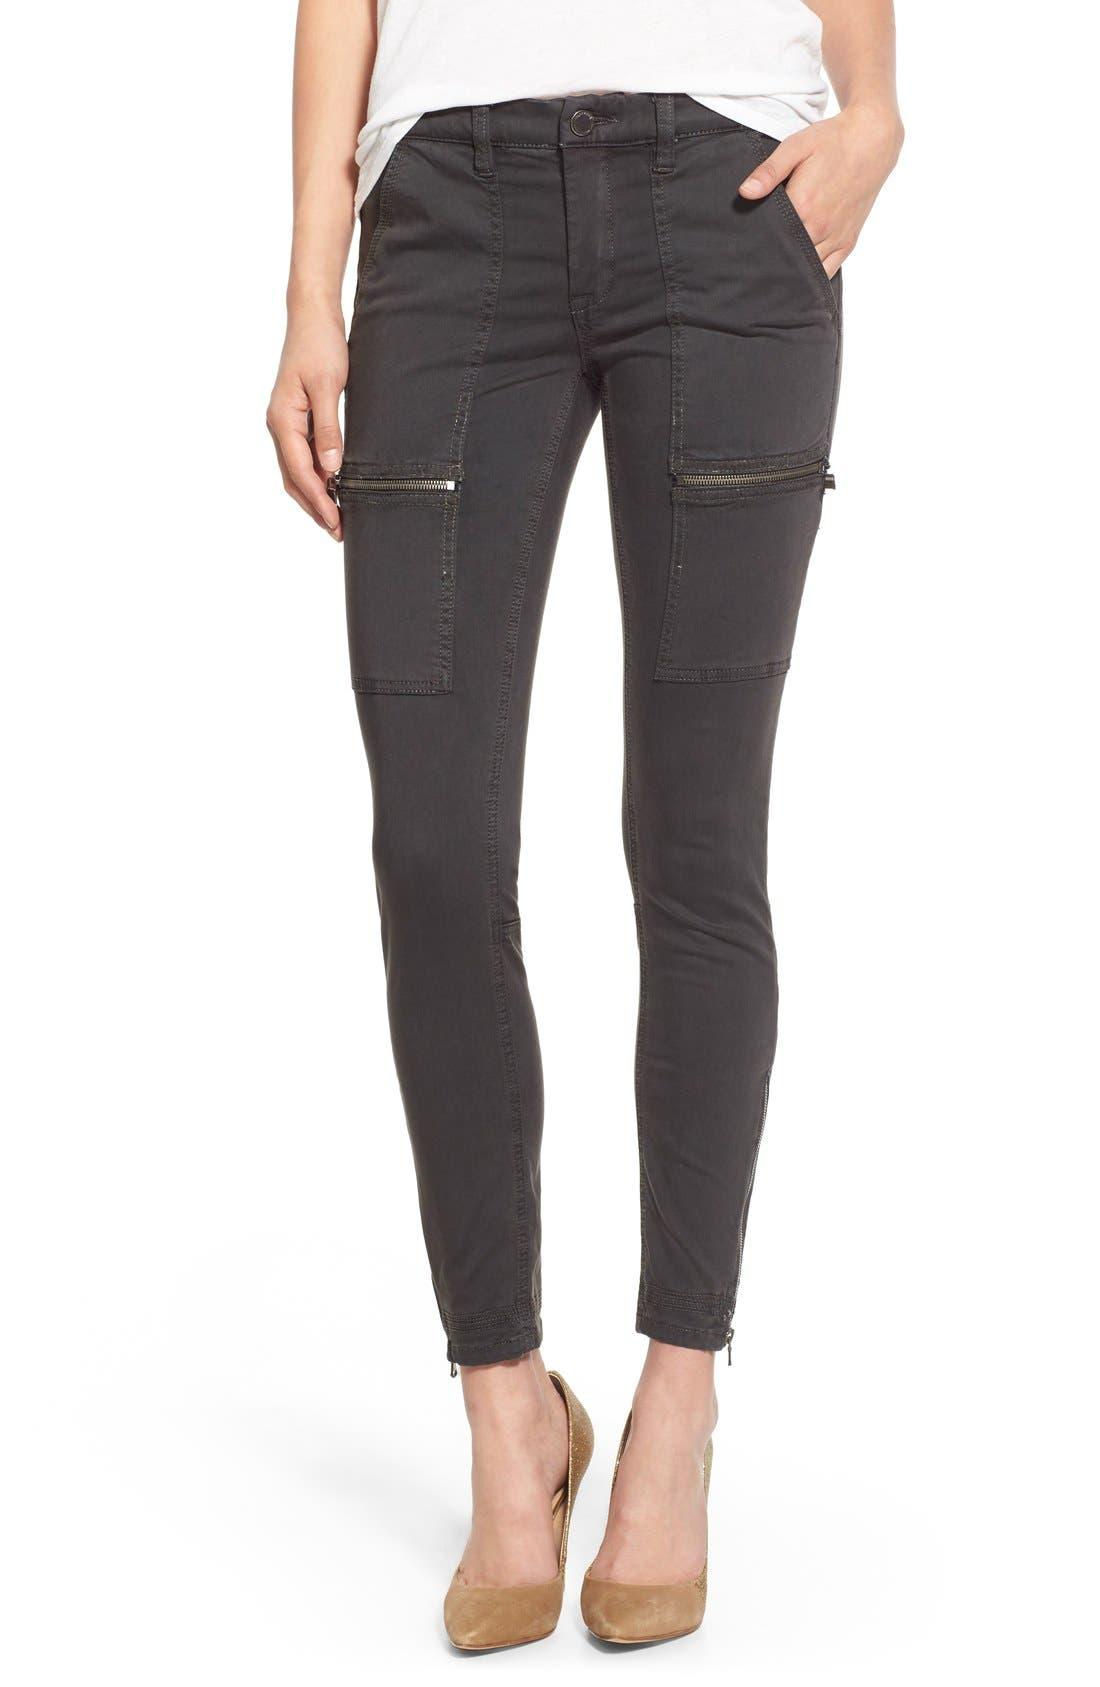 Alternate Image 1 Selected - BLANKNYC 'No New Friends' Skinny Utility Pants